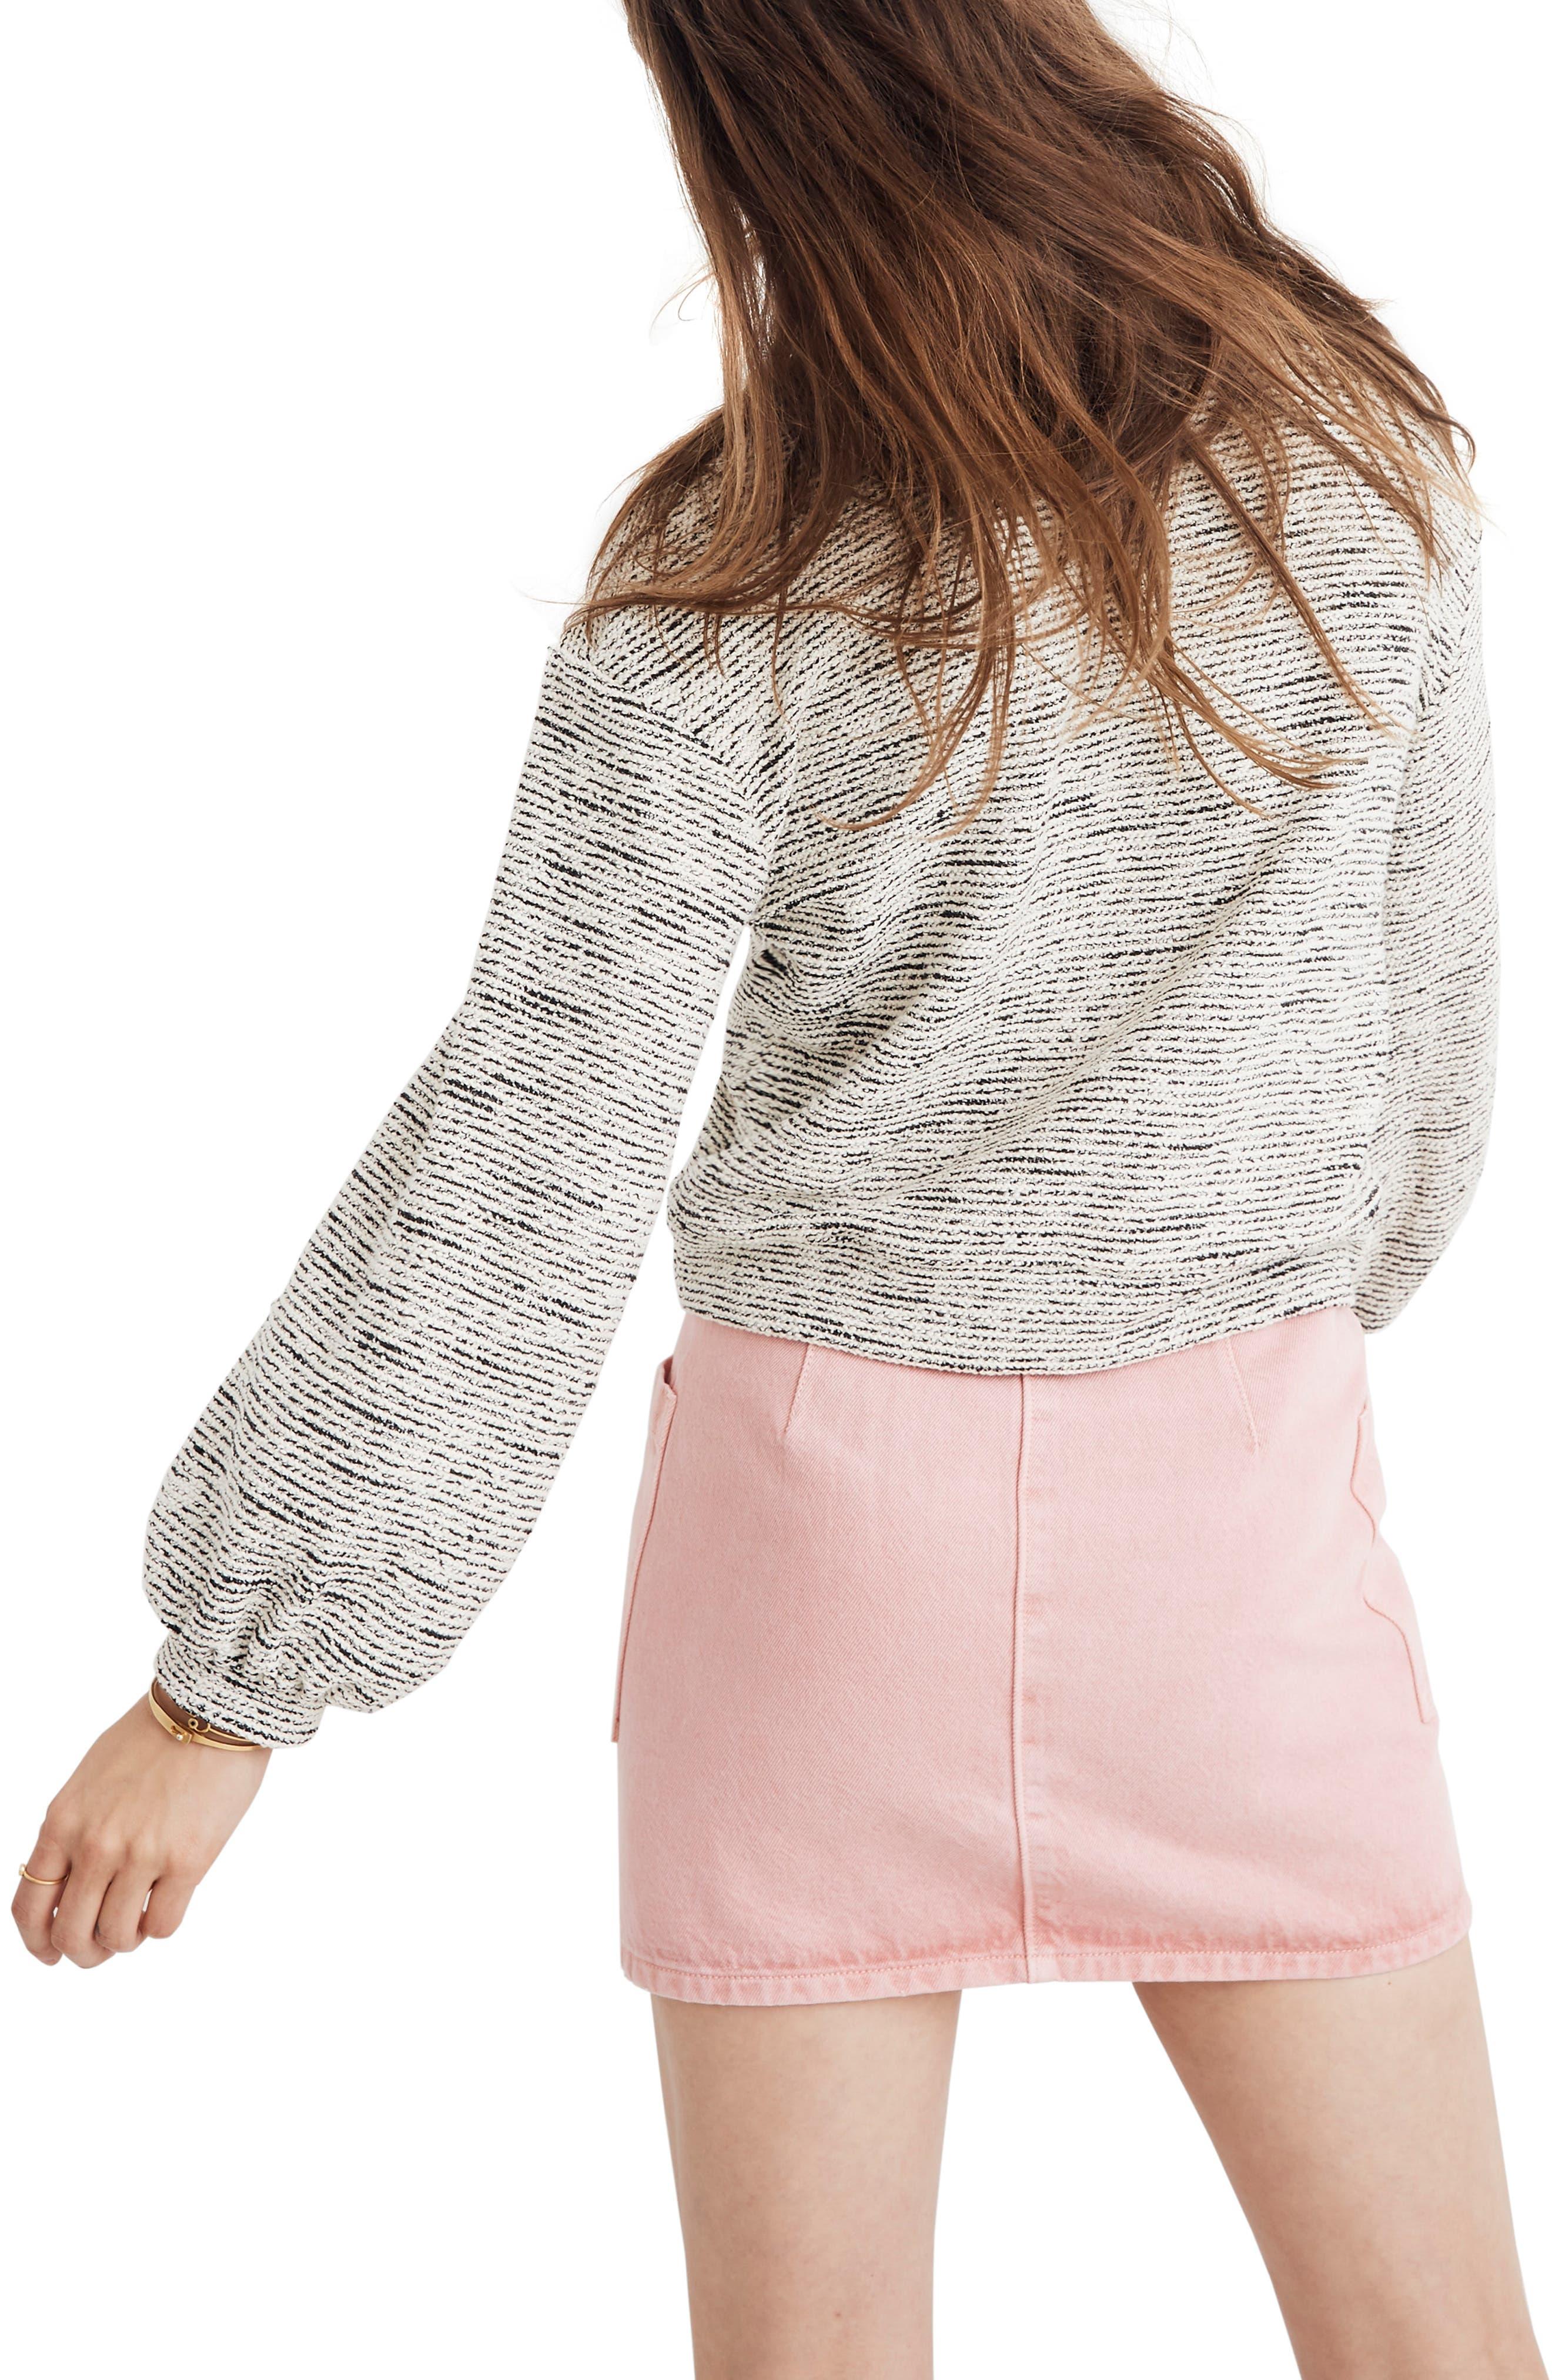 MADEWELL, Texture & Thread Bubble Sleeve Sweatshirt, Alternate thumbnail 2, color, HEATHER GREY